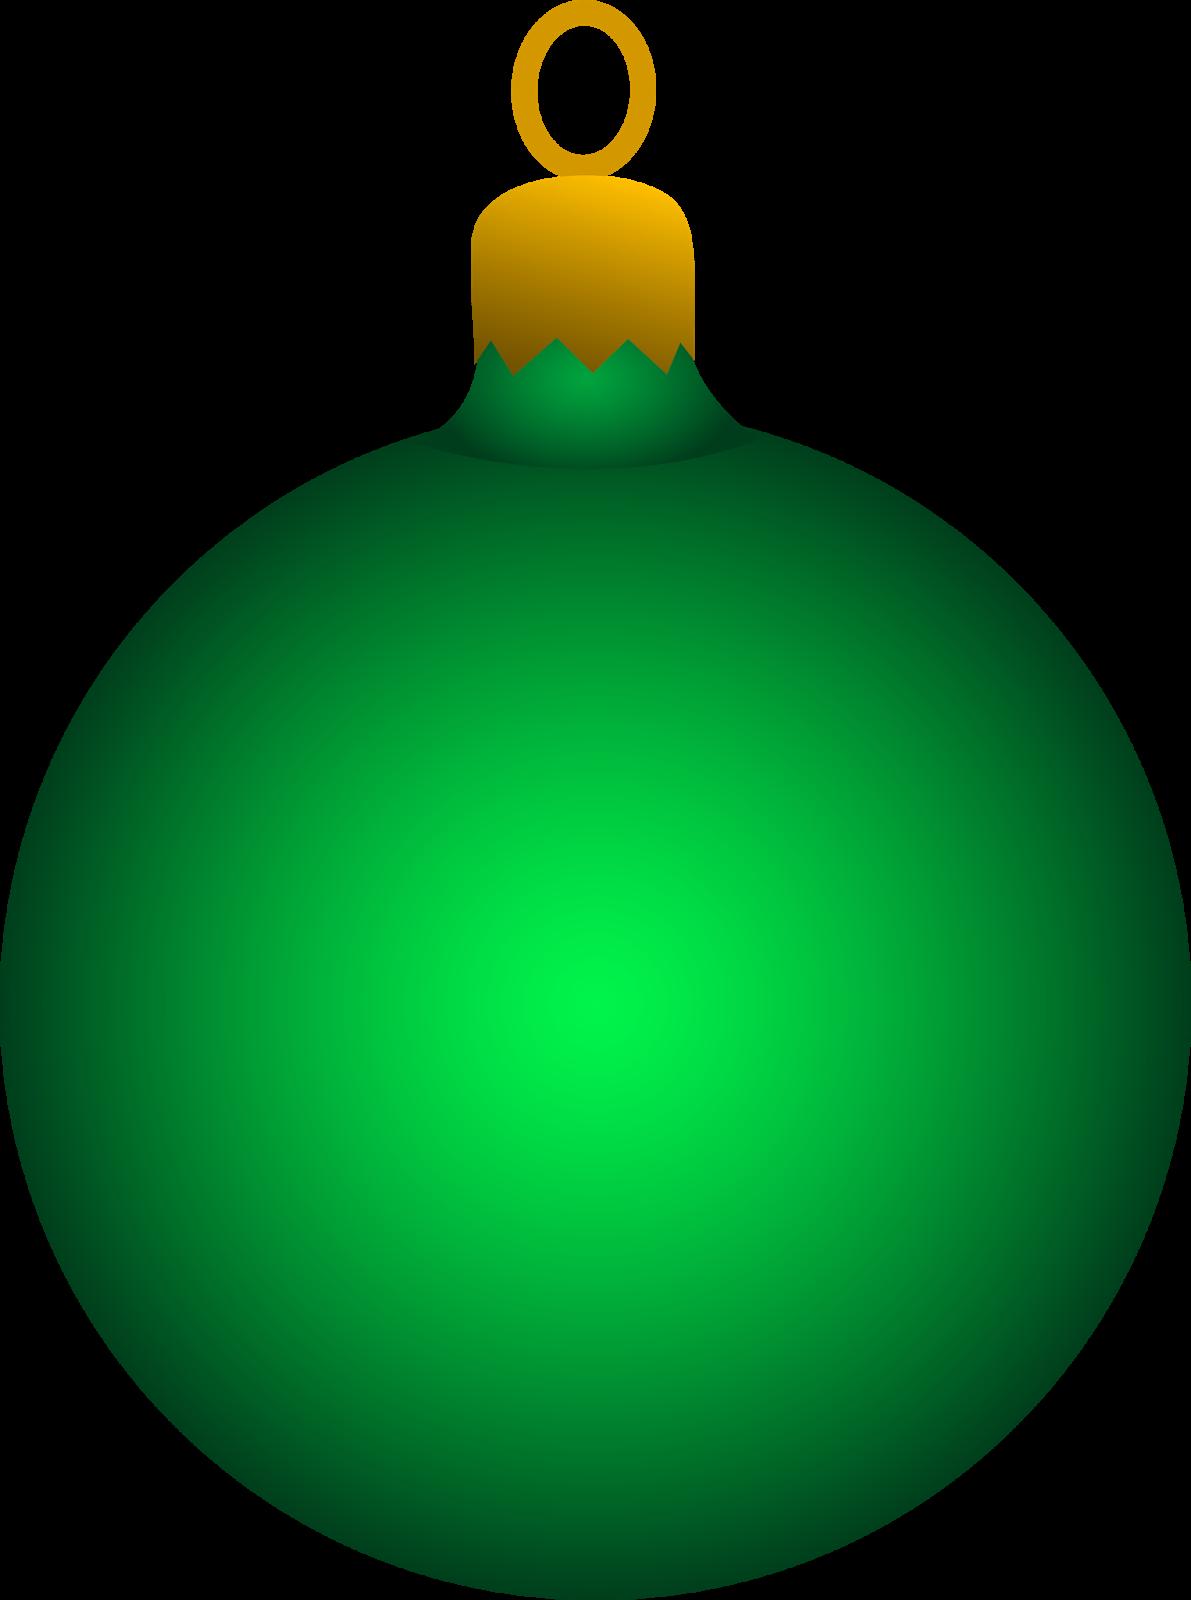 Christmas Ornaments Clipart .